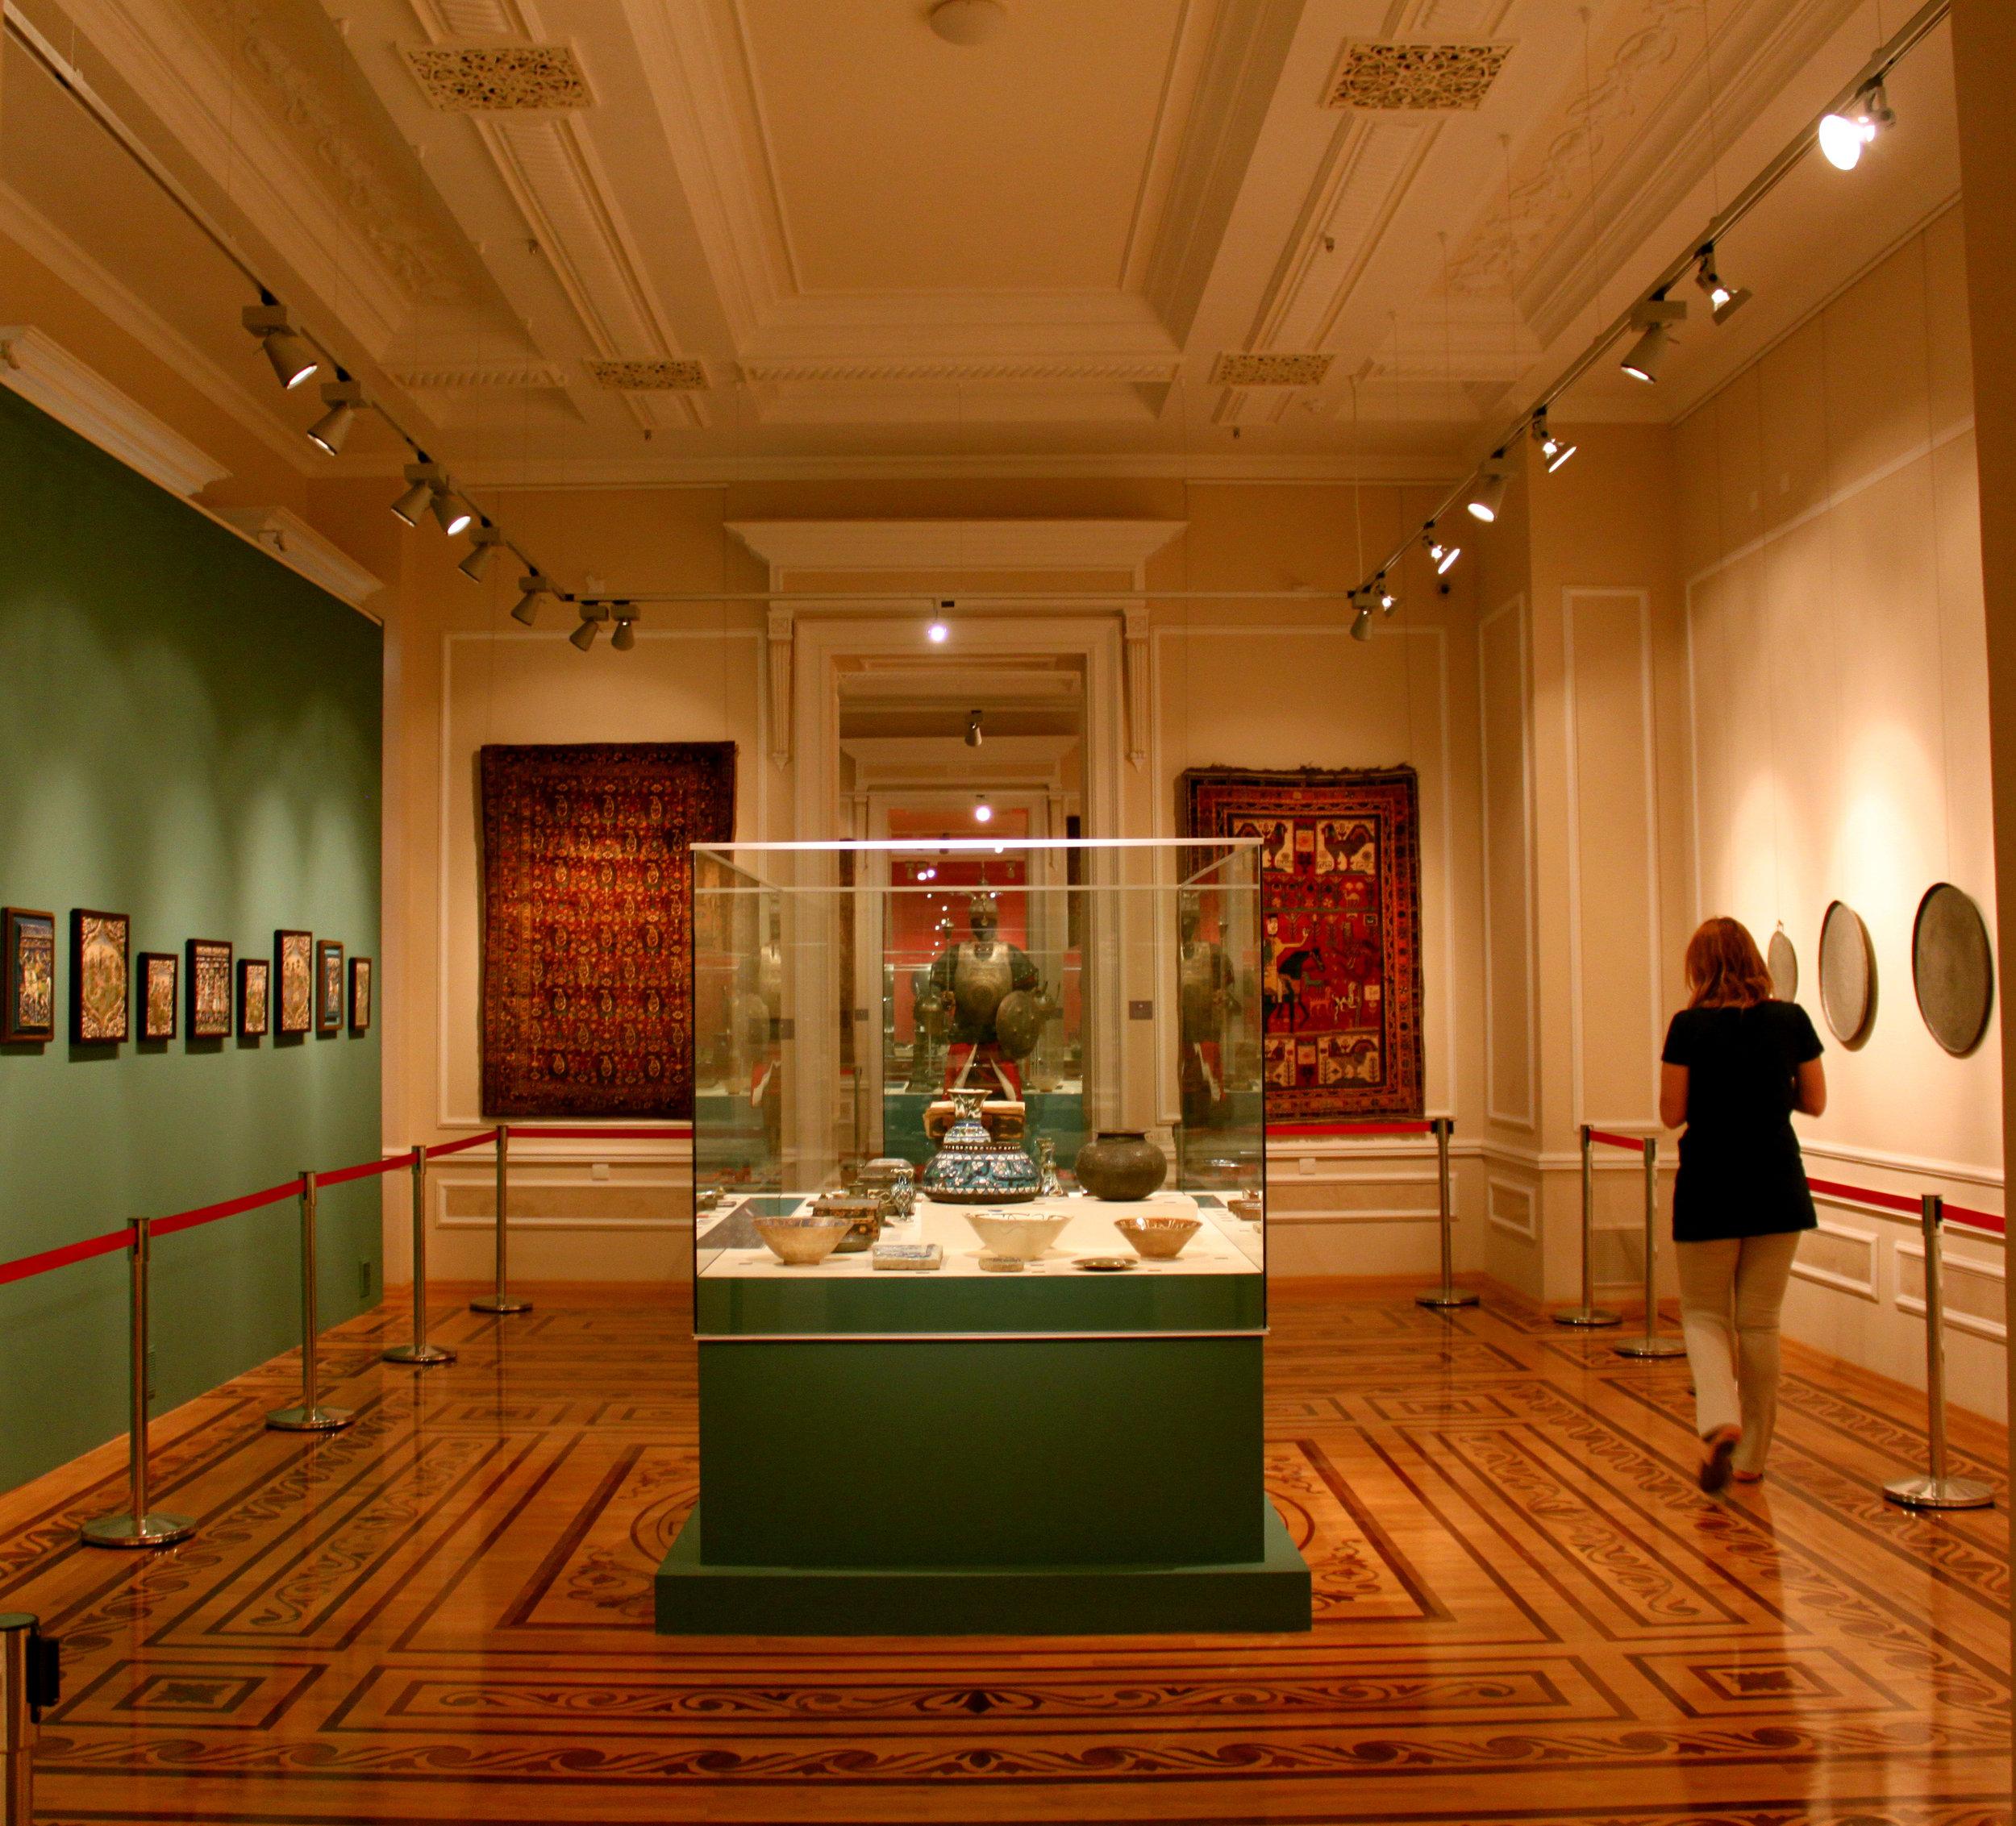 Azerbaijan National Art Museum. By Urek Meniashvili via  Wikimedia Commons